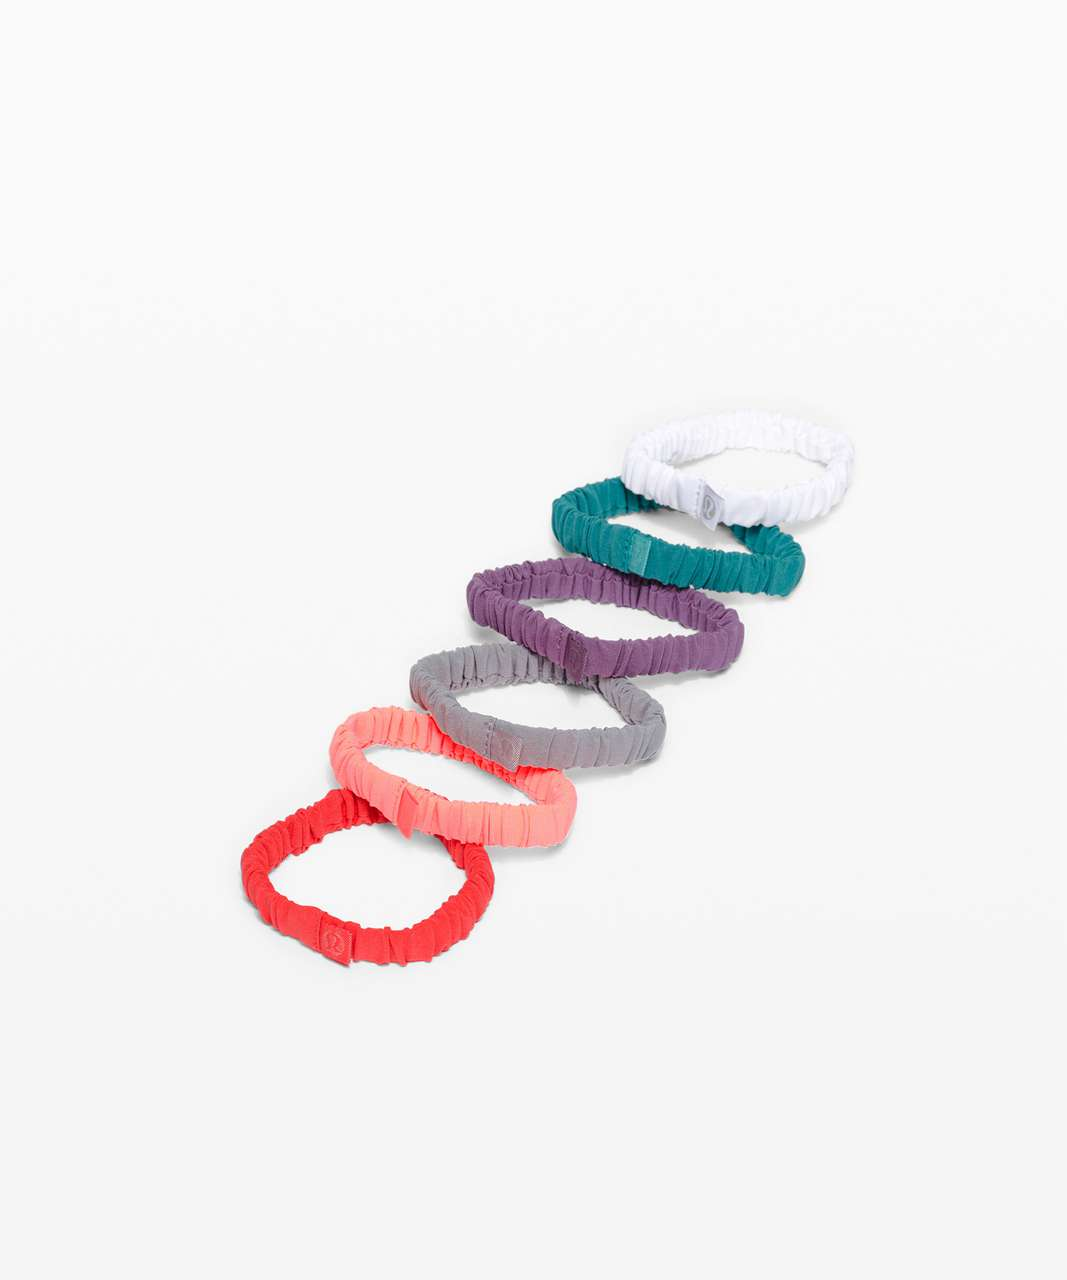 Lululemon Skinny Scrunchie *6 Pack - Pink Punch / Sunset / Rhino Grey / Grape Mauve / Hawaiian Blue / White